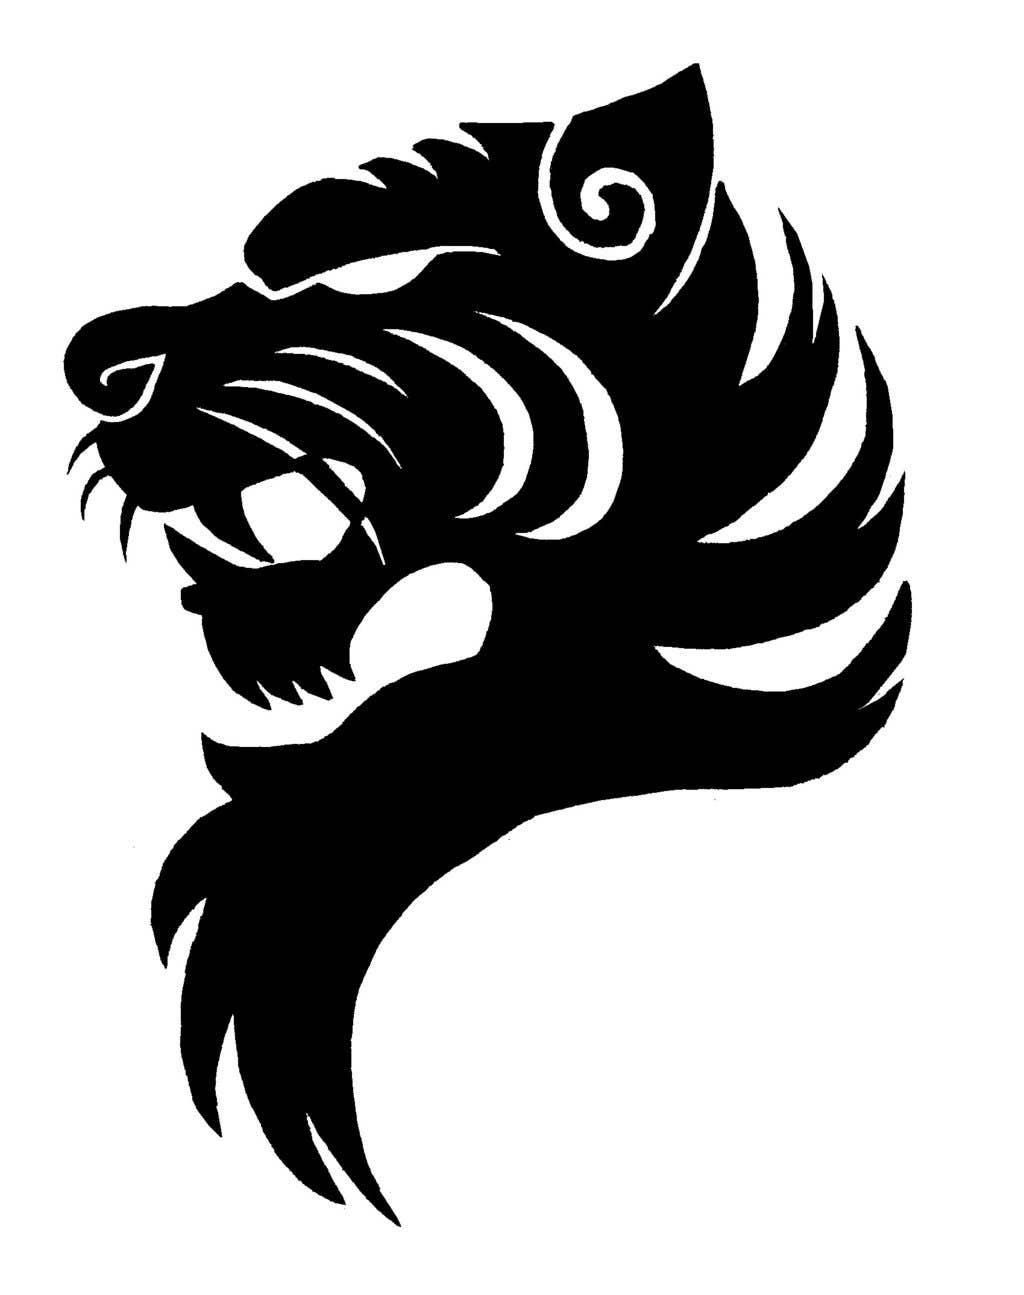 tiger head logo - HD1024×1295